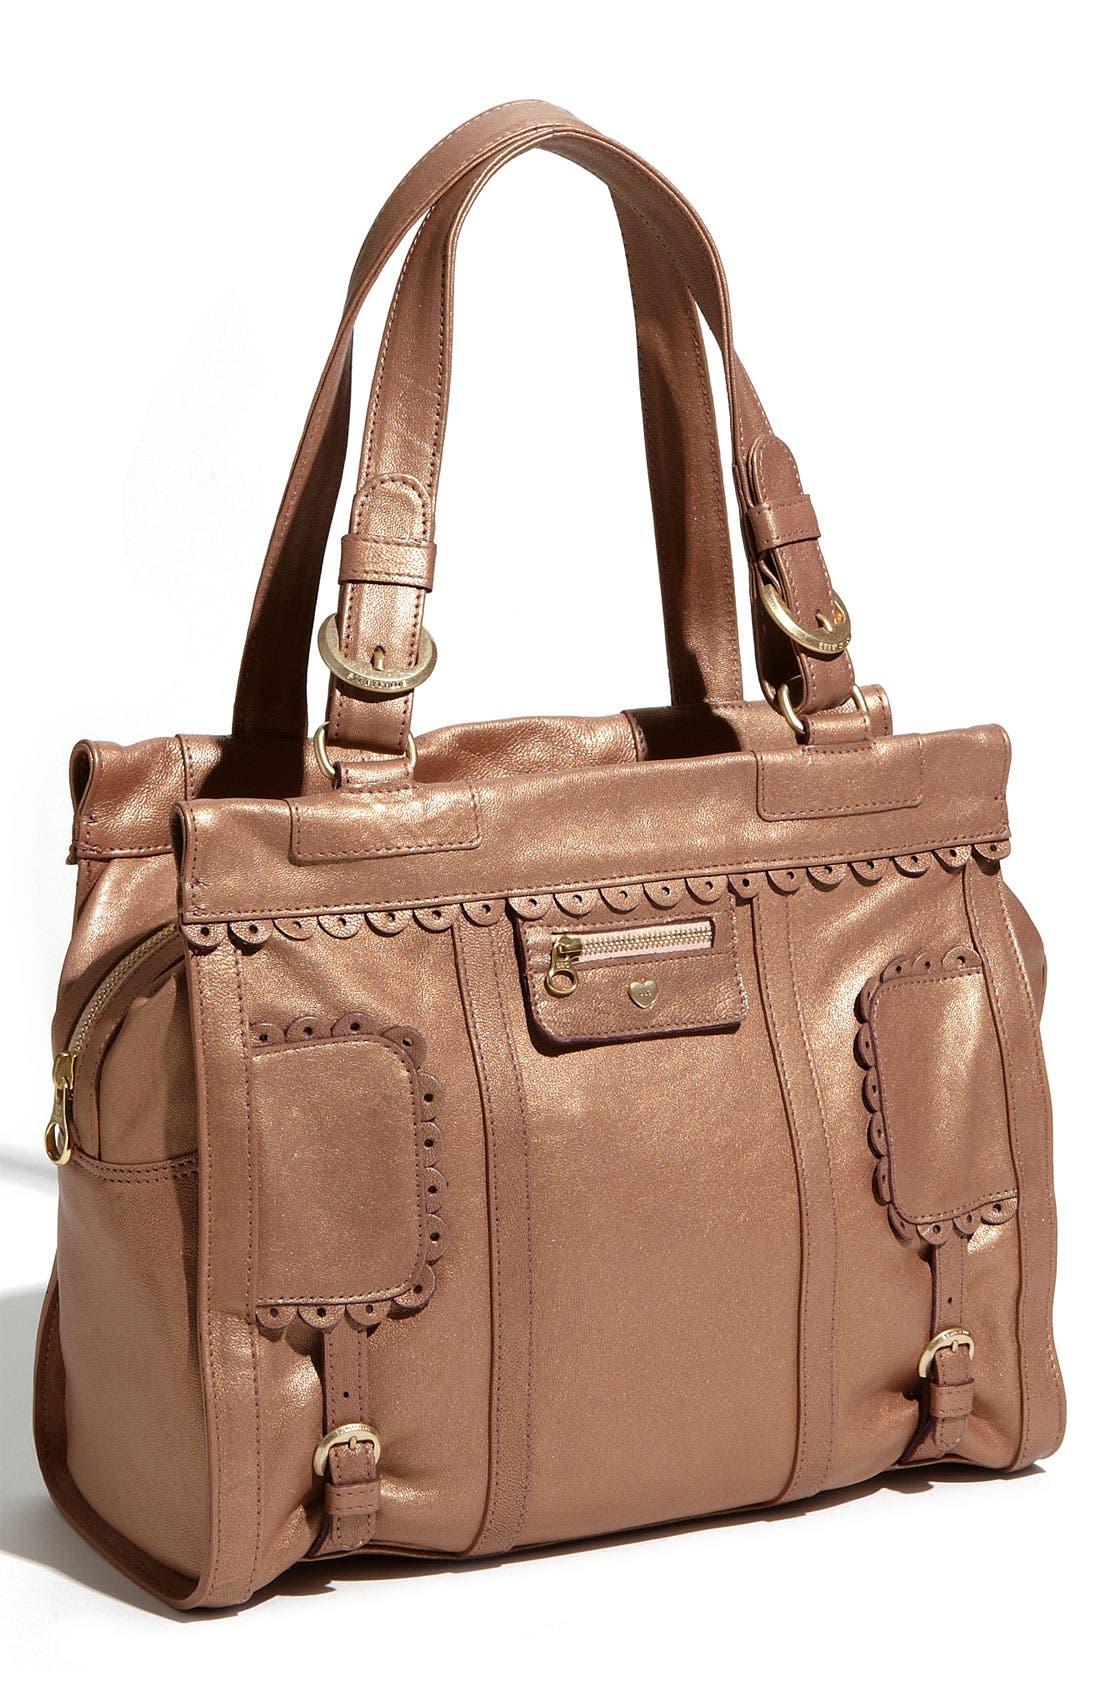 Main Image - See By Chloé 'Poya Metallic Vintage' Leather Shoulder Bag